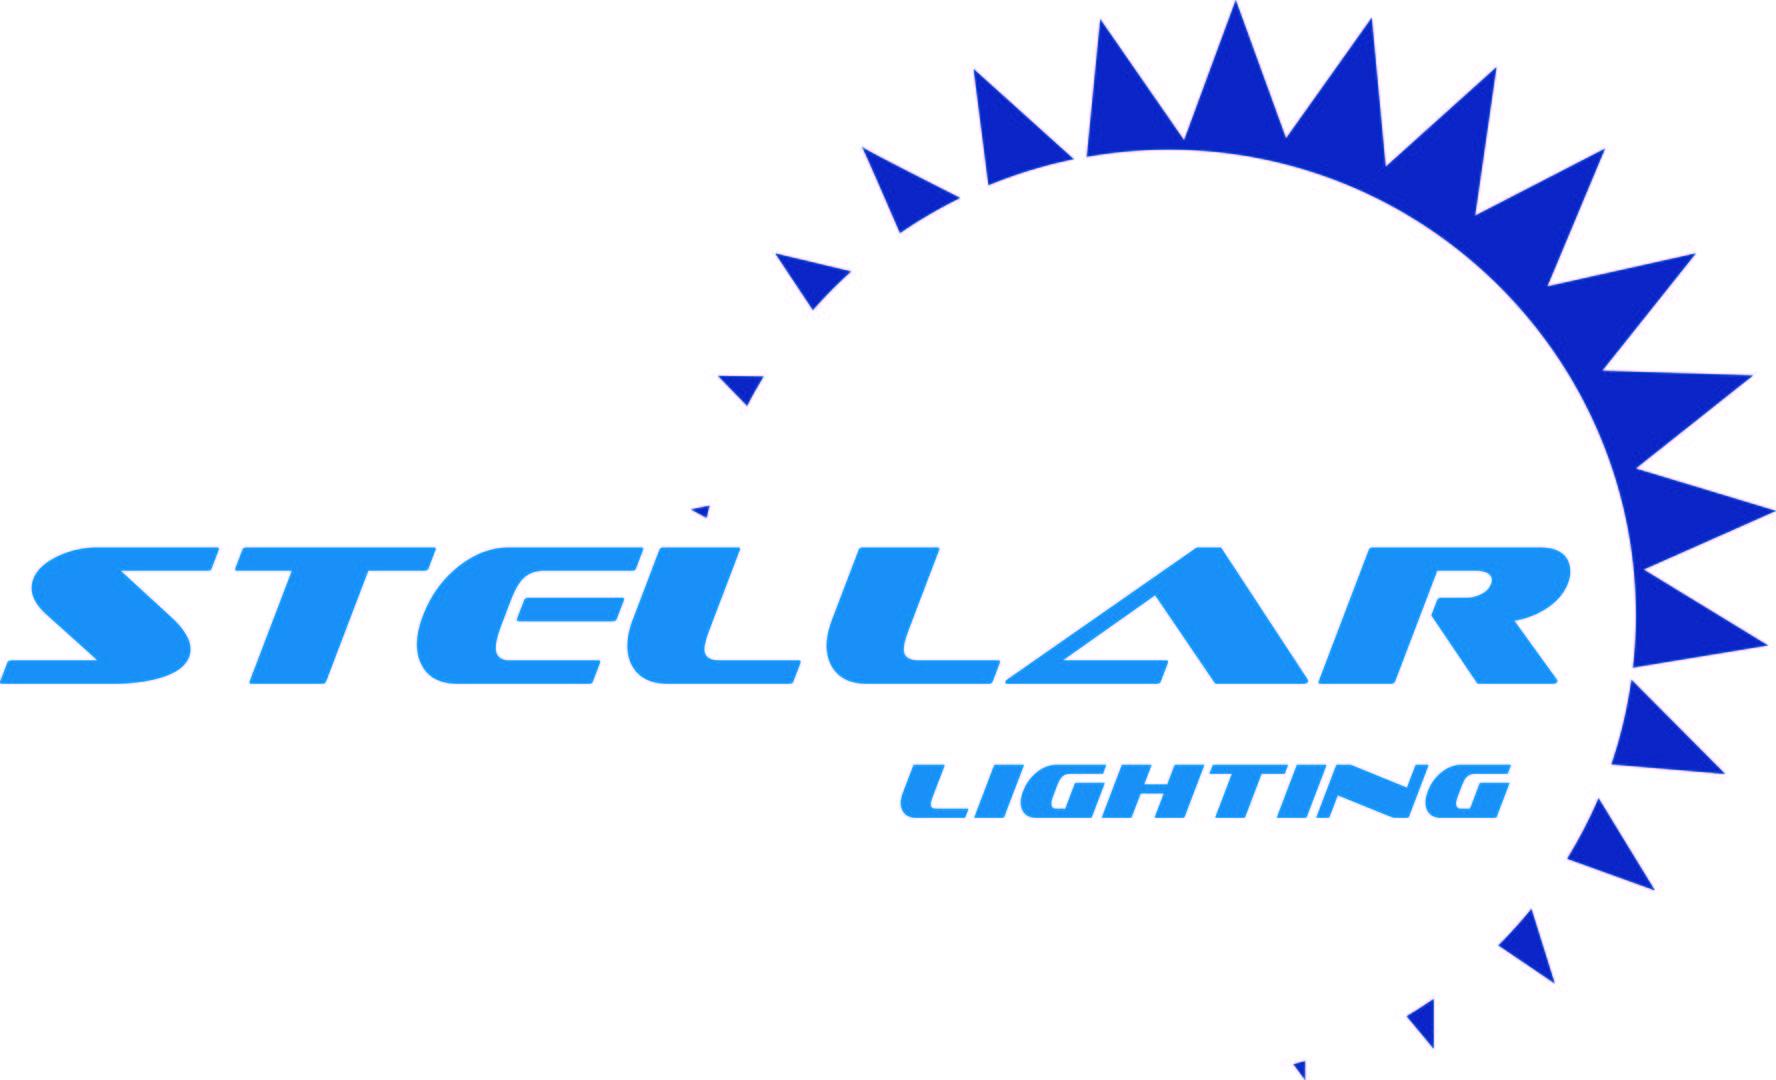 stellar lighting abc marketing inc